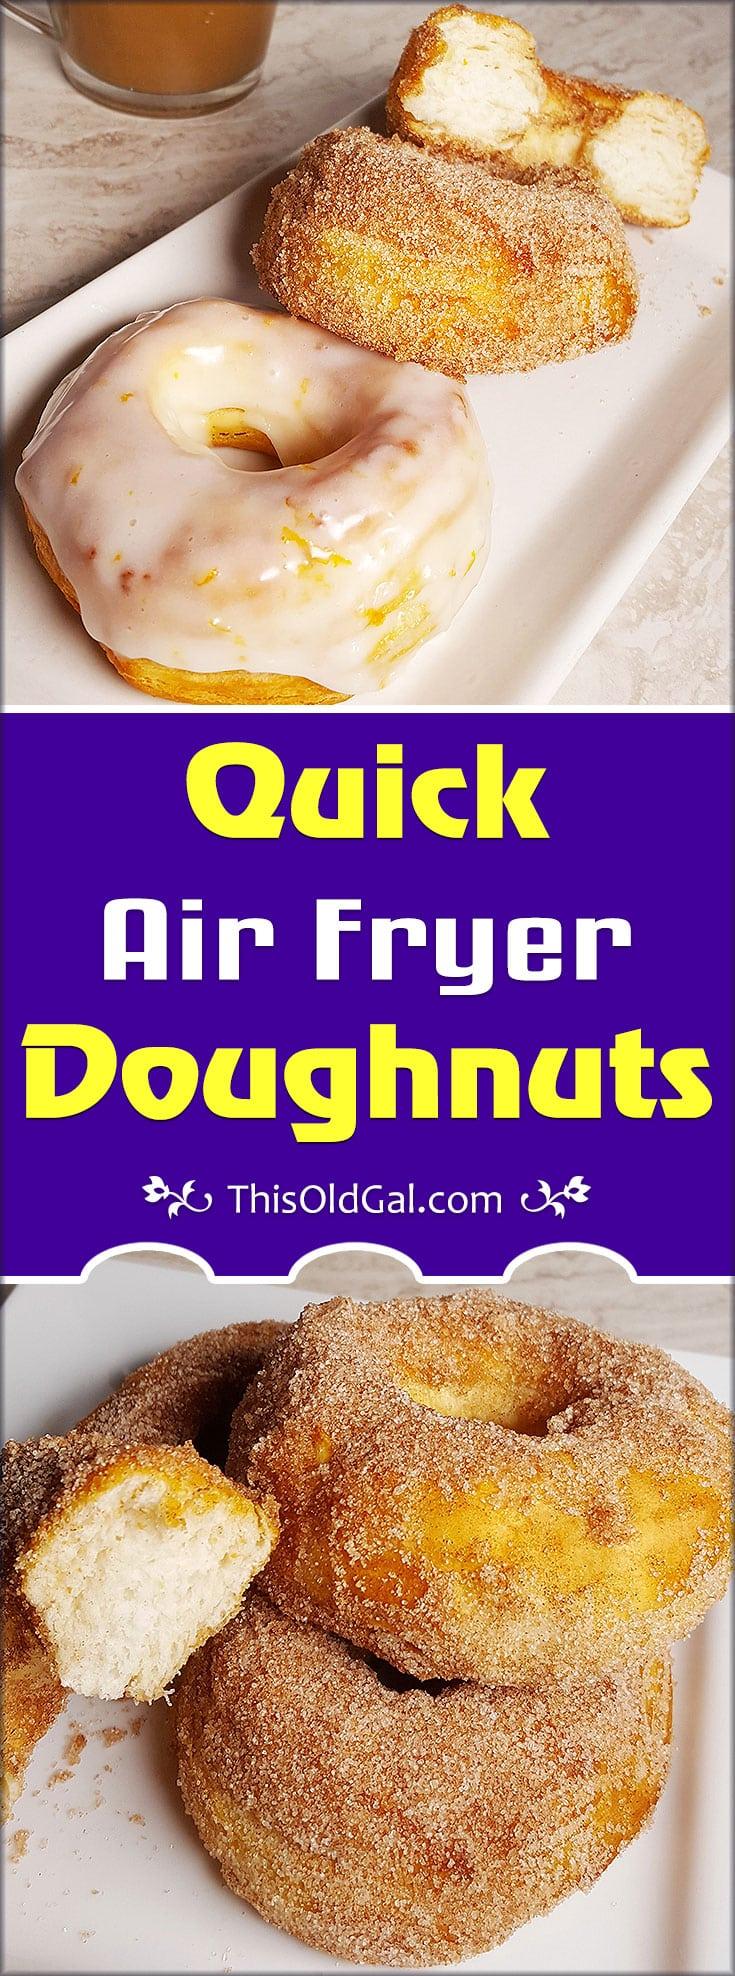 Air Fryer Glazed Doughnuts